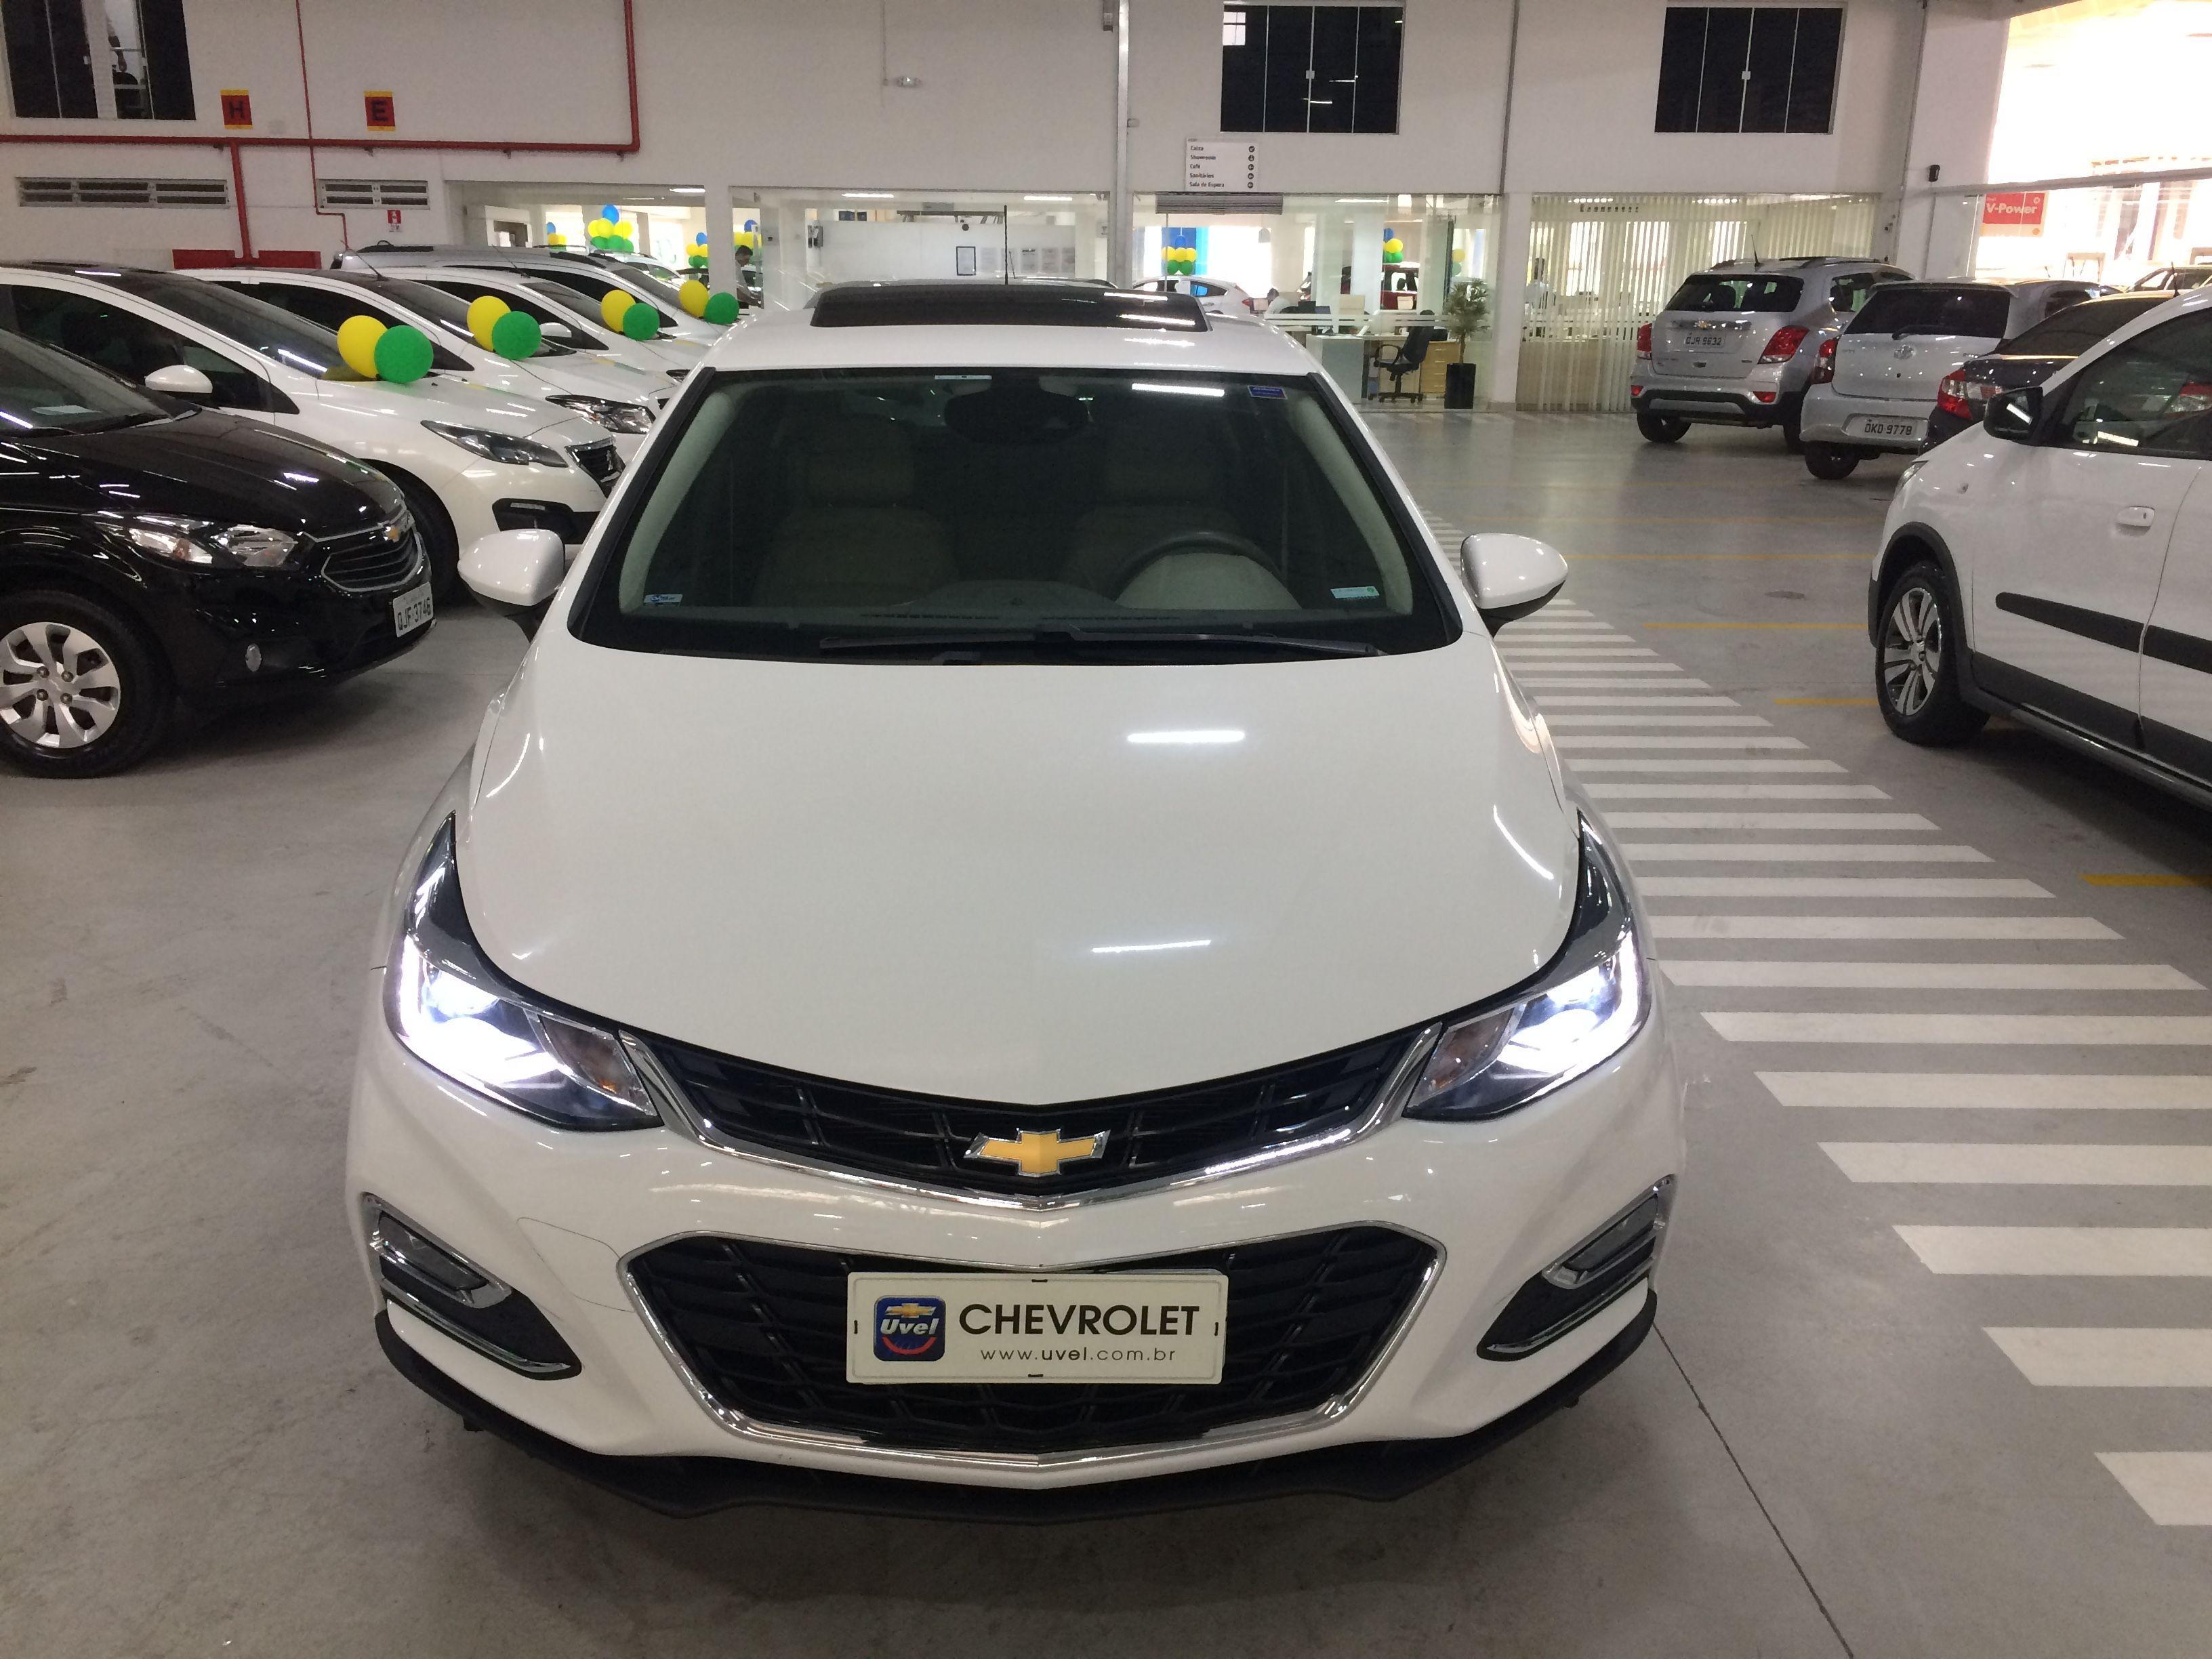 Chevrolet CRUZE HATCH LTZ 1.4T 2017